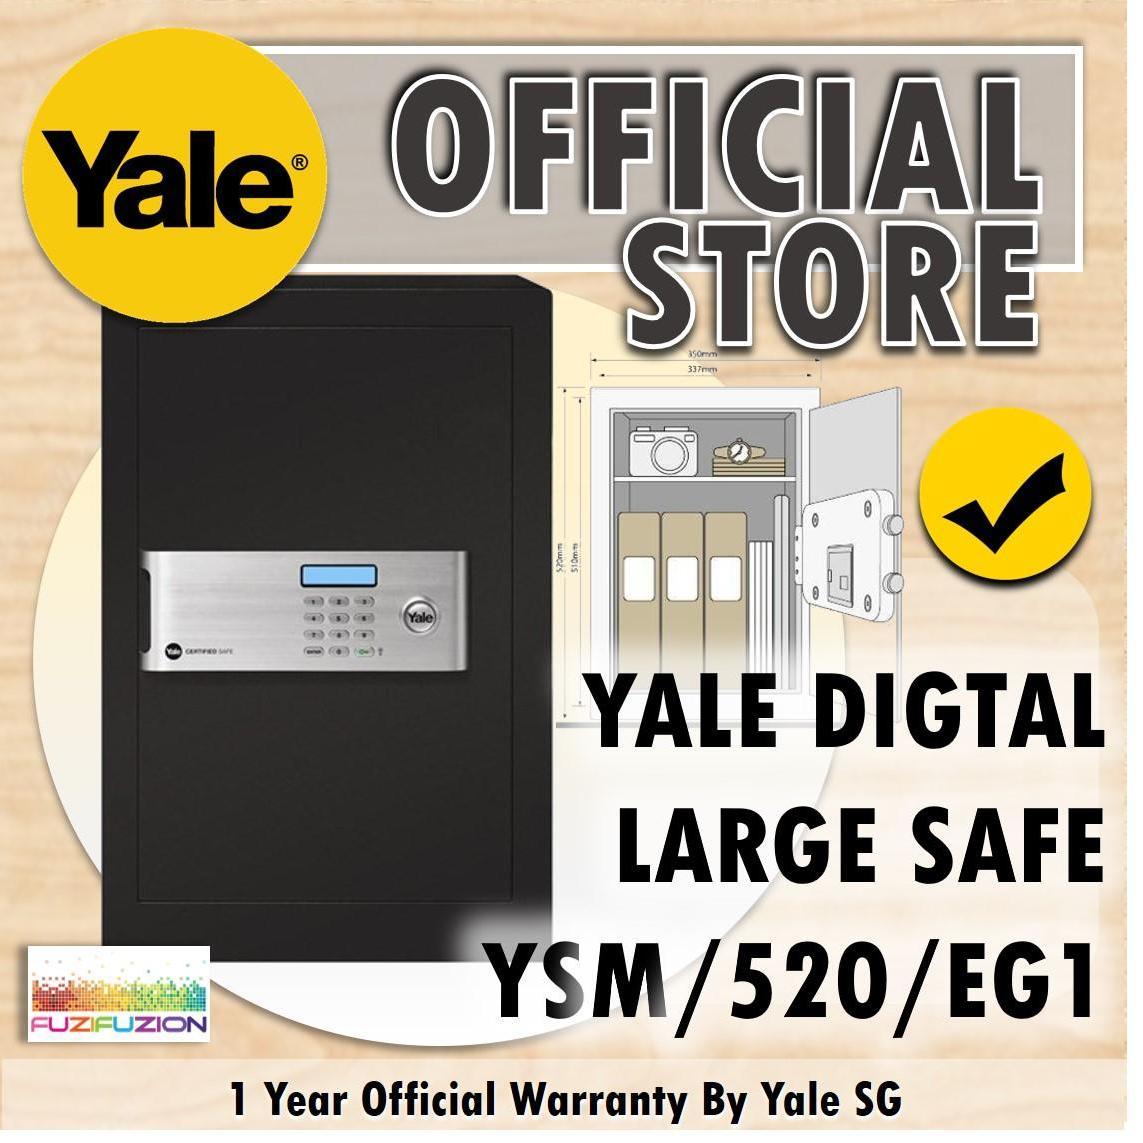 Yale YSM/520/EG1 Large Certified Digital Safe Box